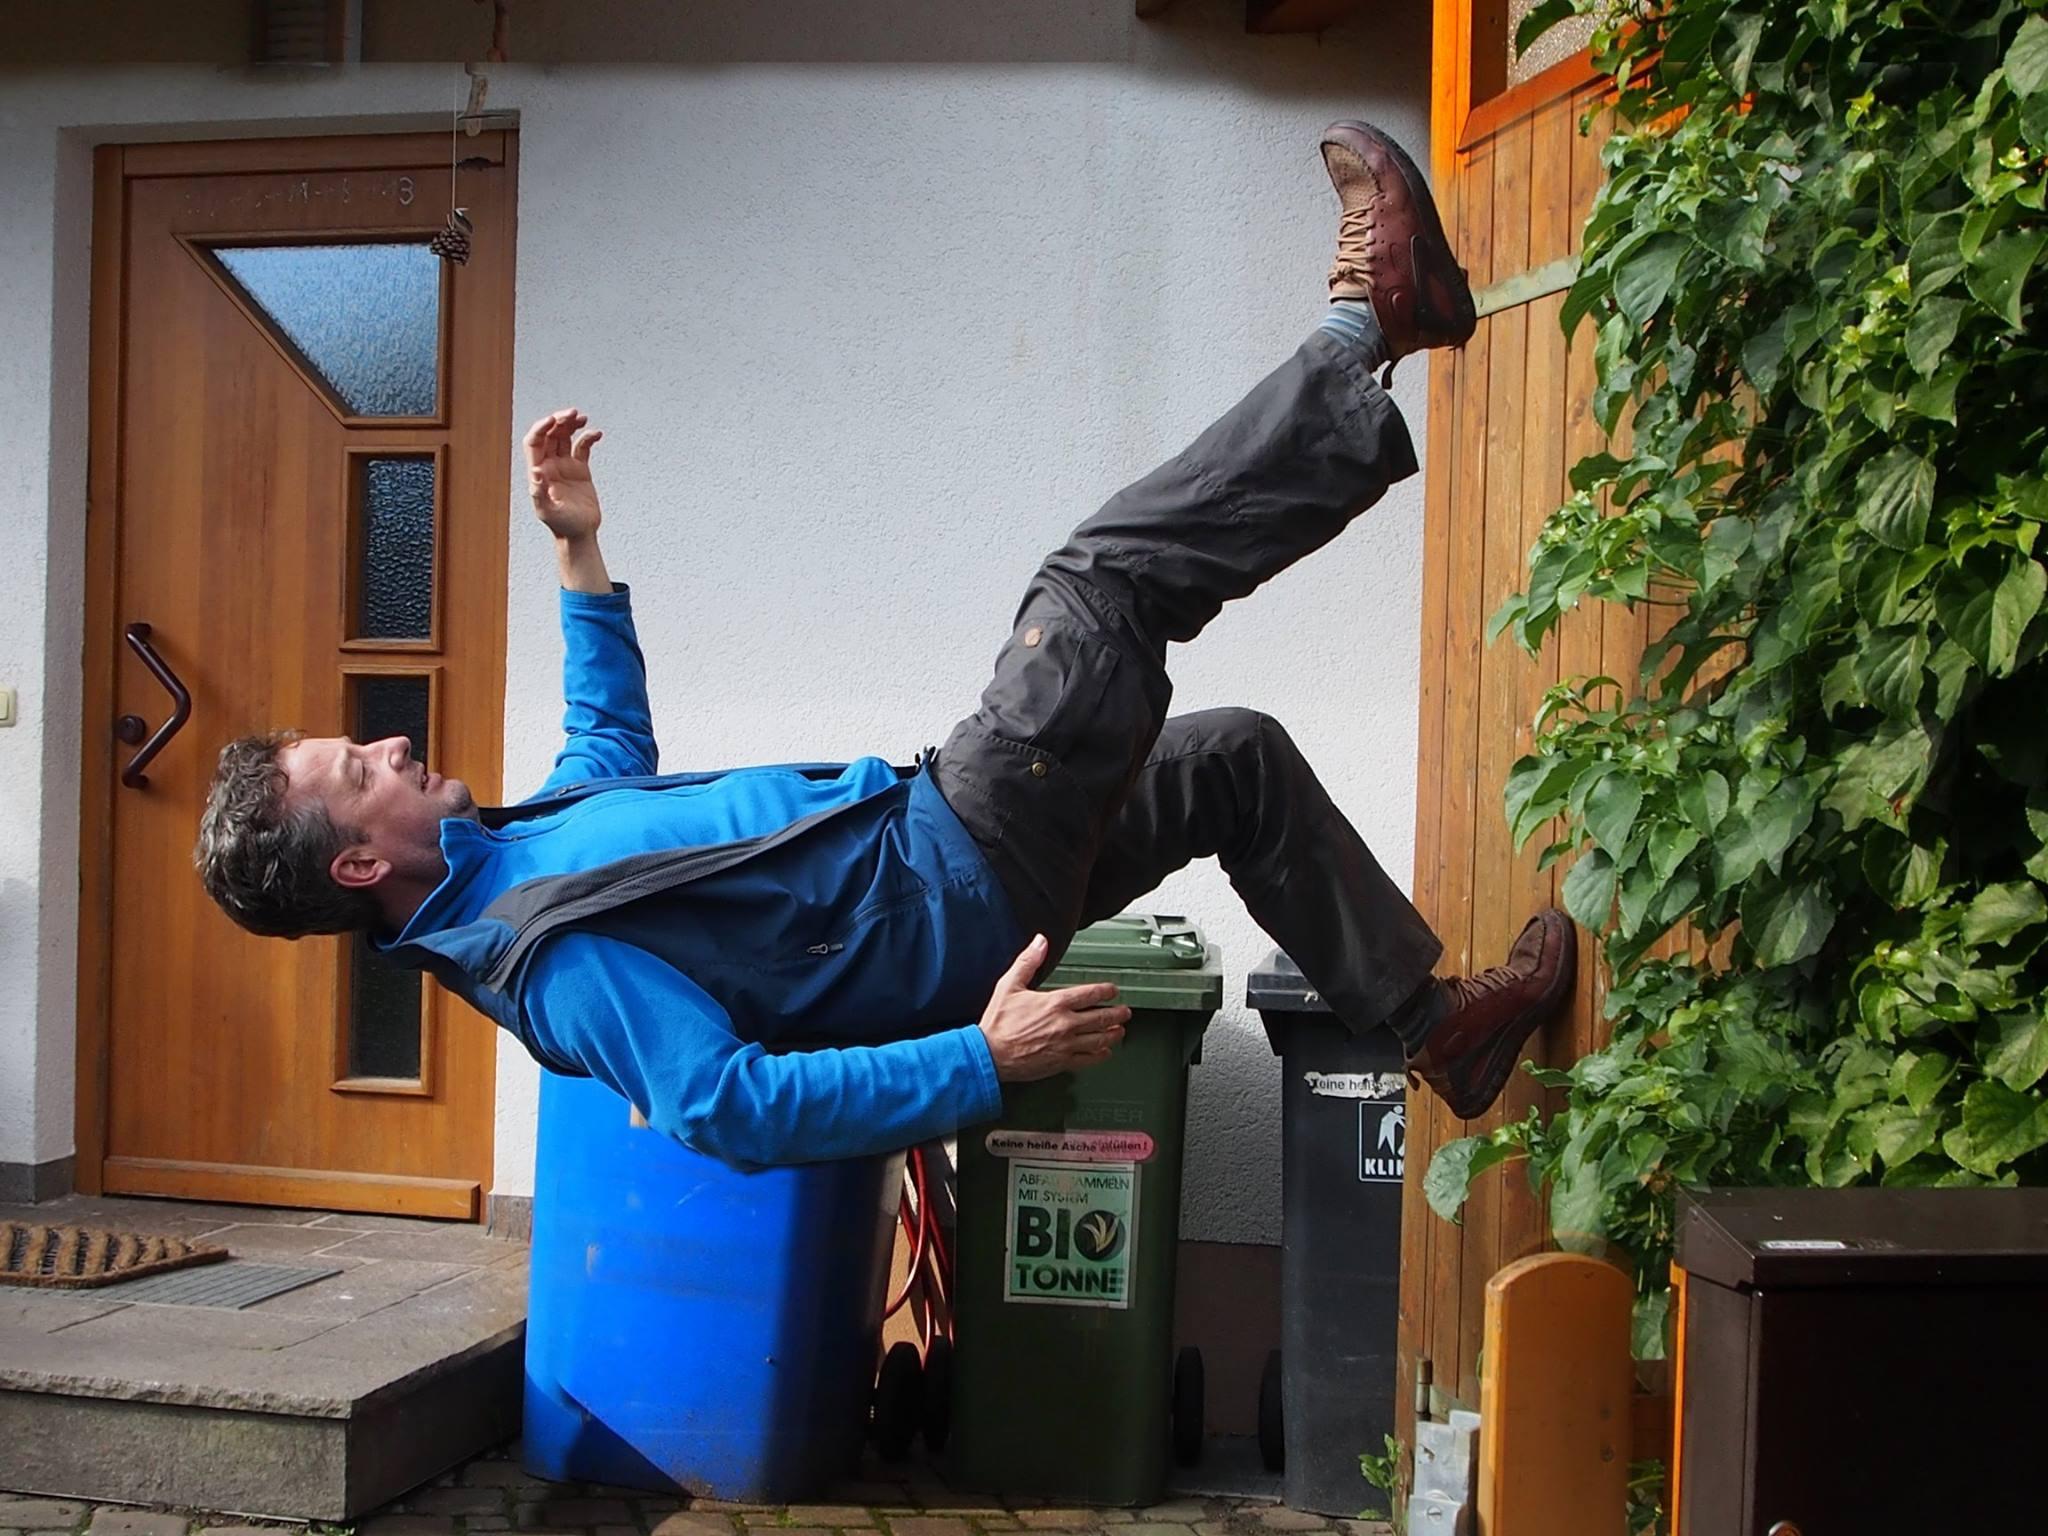 Free Unsplash photo from Christoph Bichler